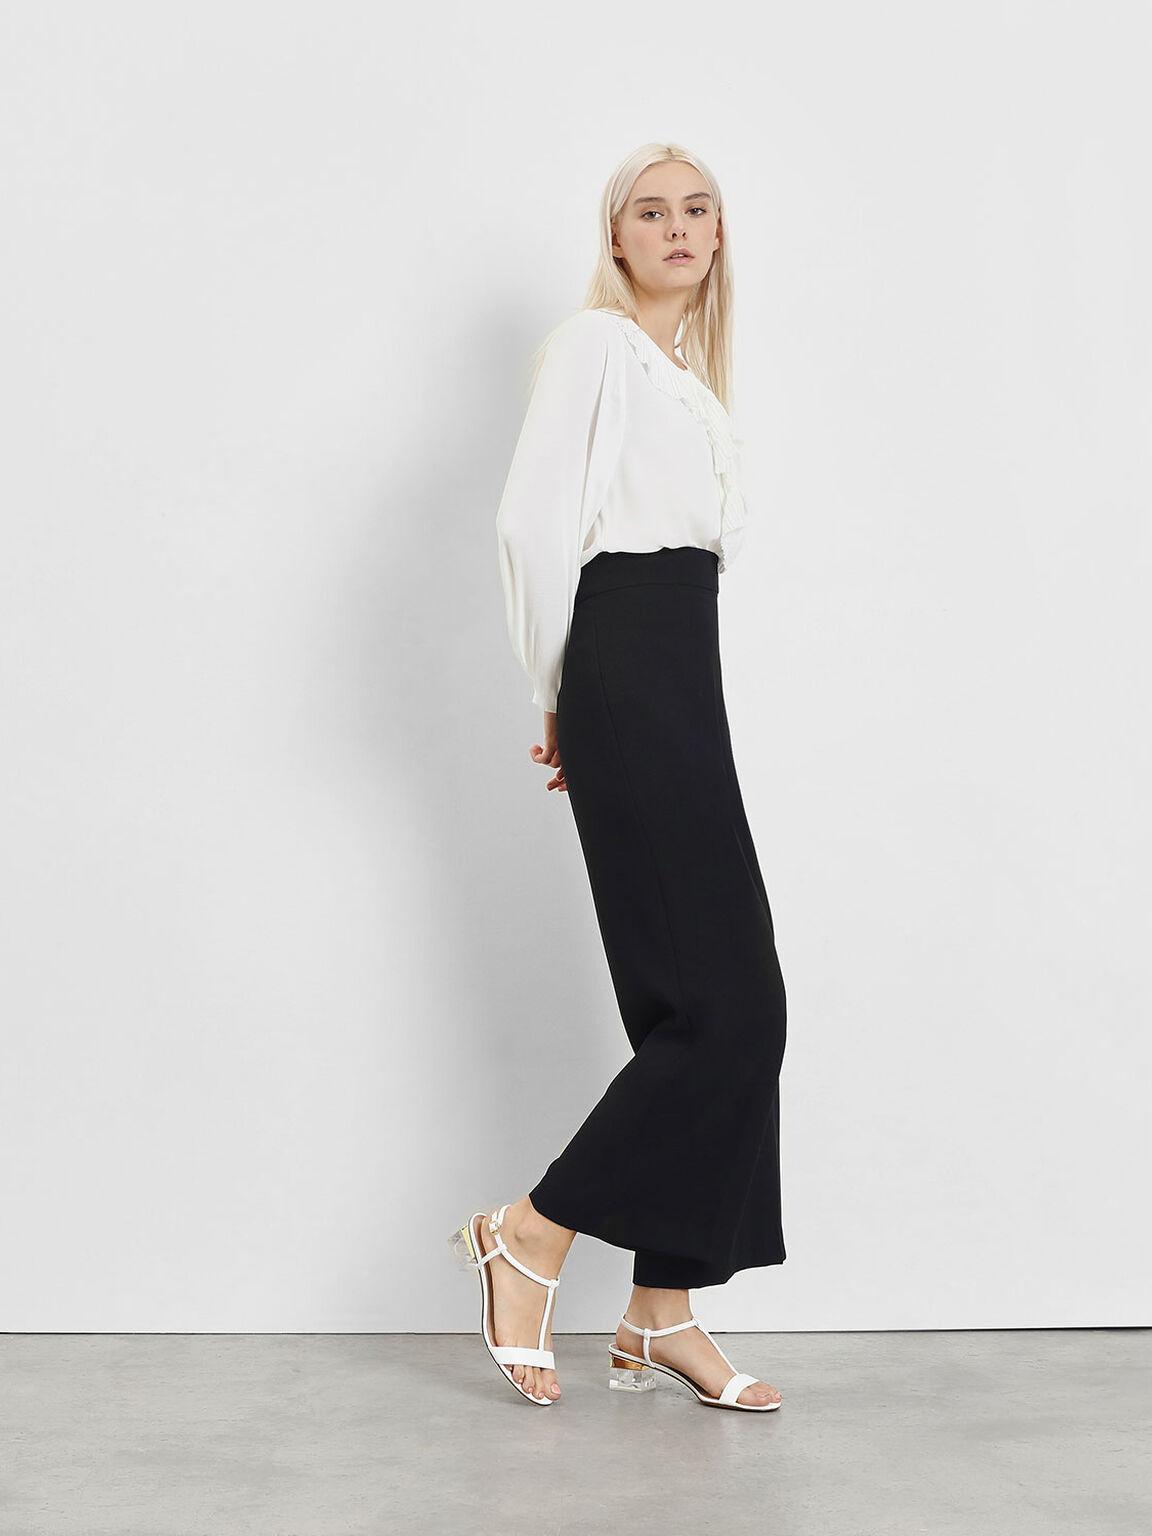 T-Bar Lucite Heel Sandals, White, hi-res